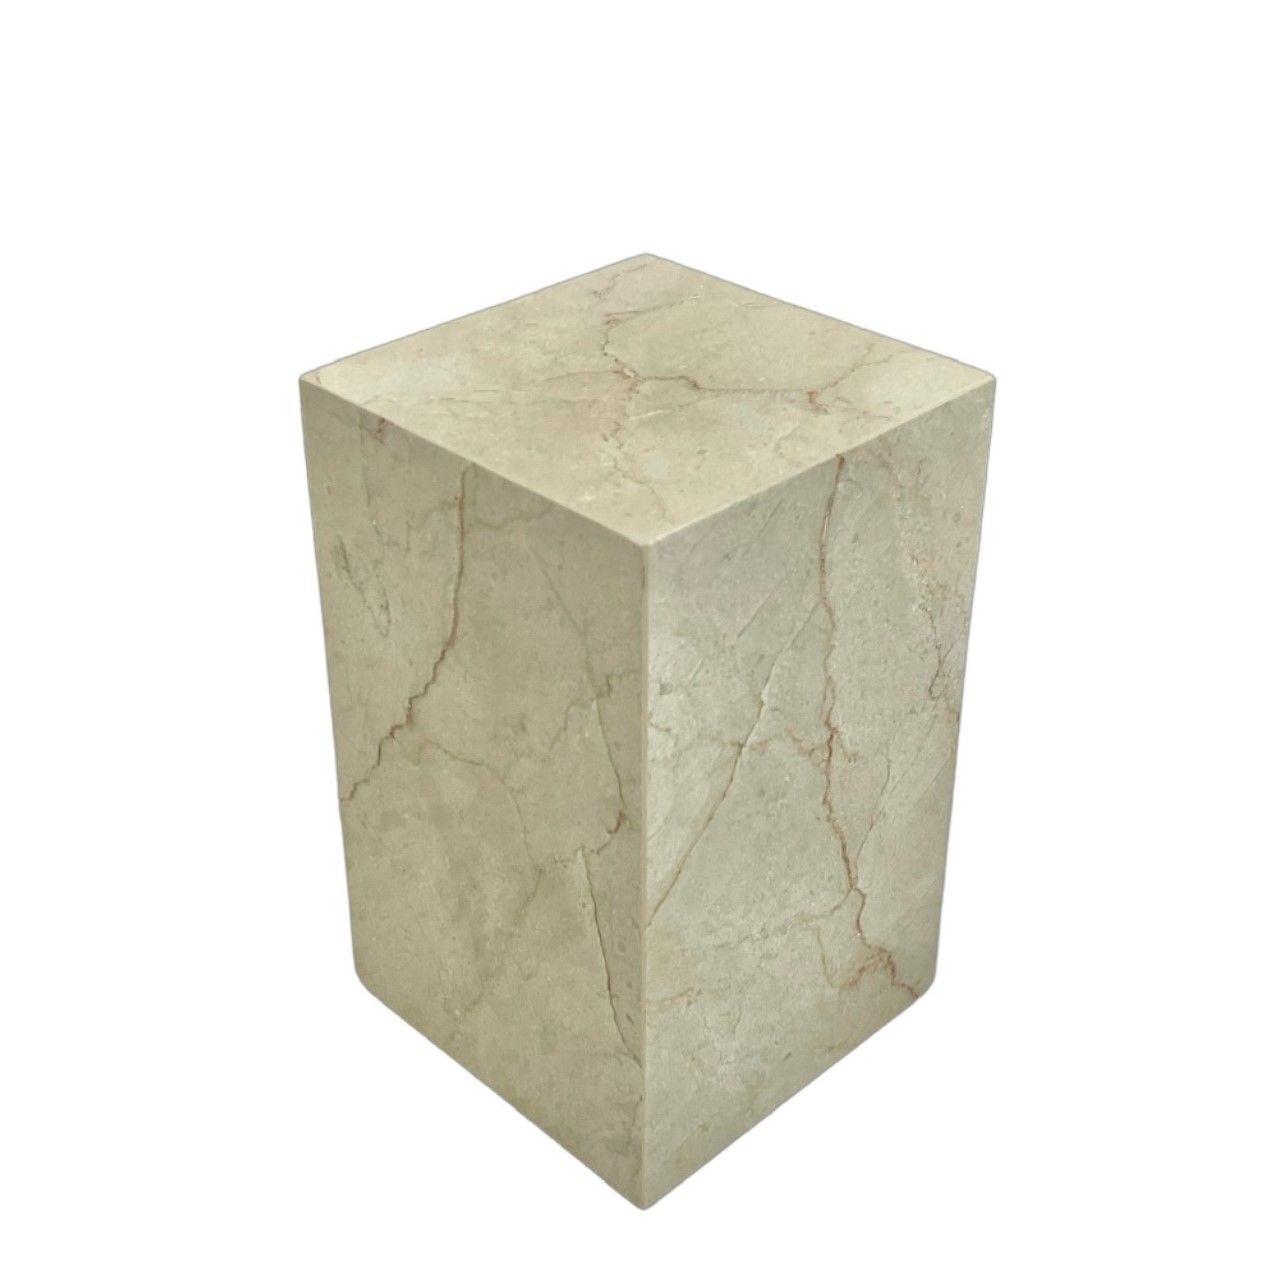 https://www.limboeurope.com/urnas-funerarias